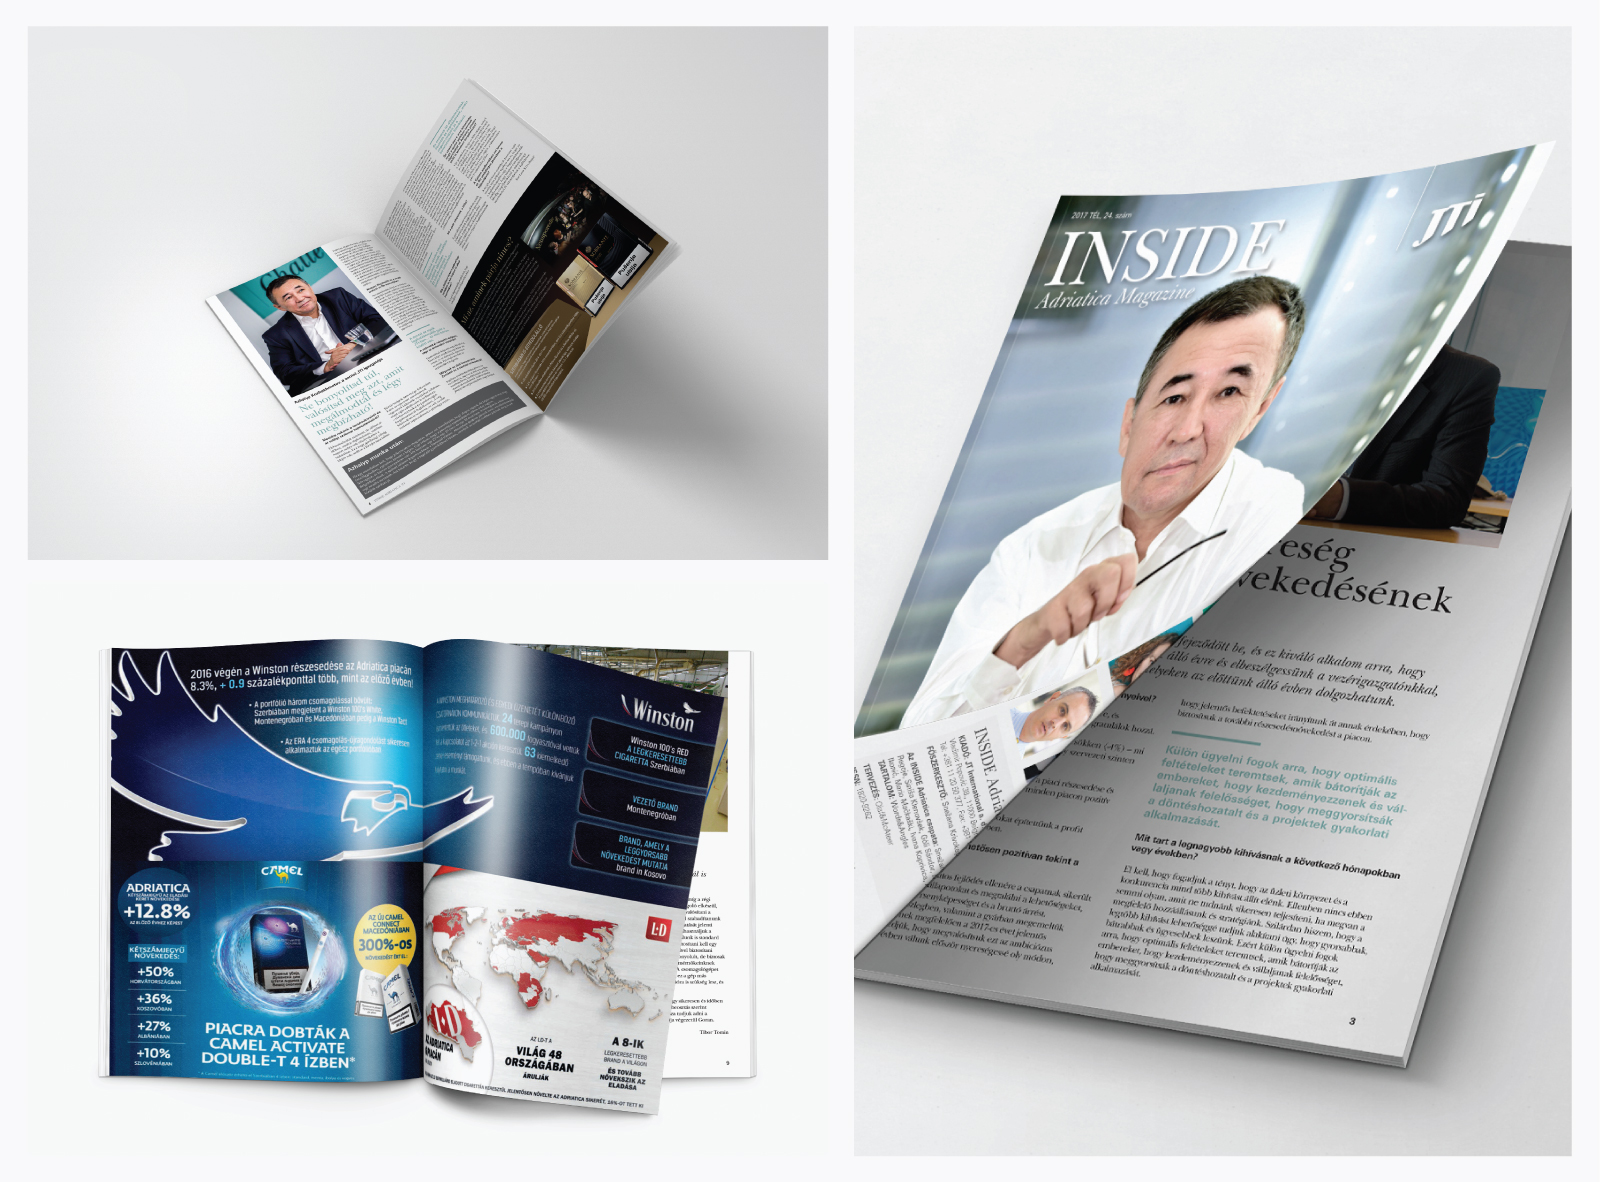 JTI Inside Magazine